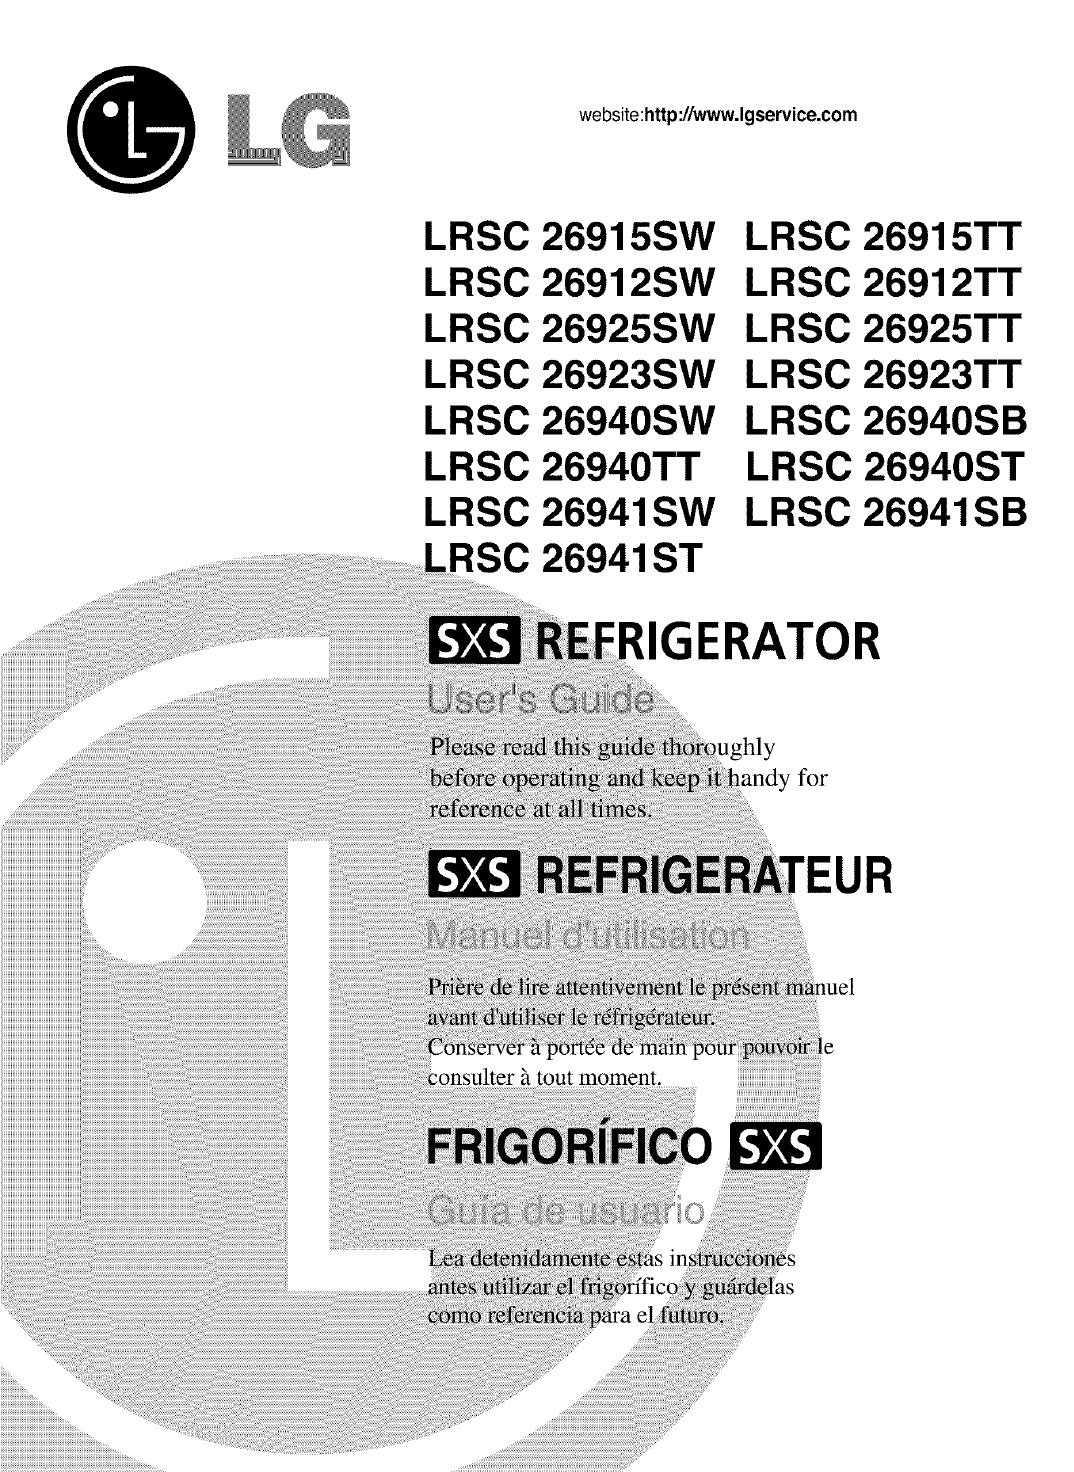 Lg Lrsc26912sw User Manual Refrigerator Manuals And Guides L0521425 Schematics